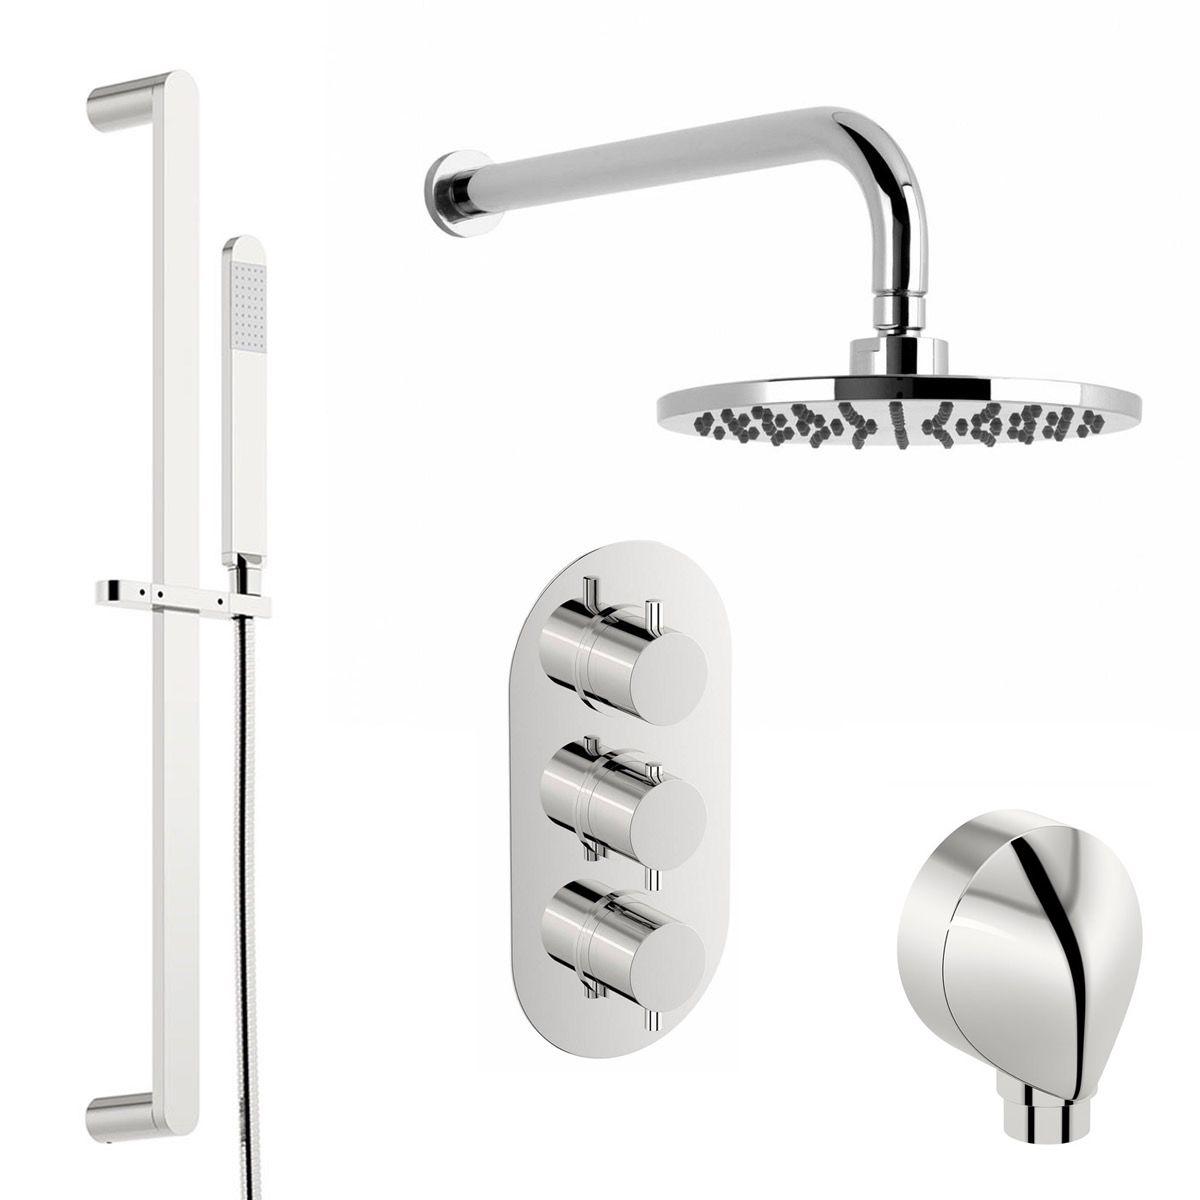 Mode Harrison thermostatic triple shower valve shower set | Shower ...